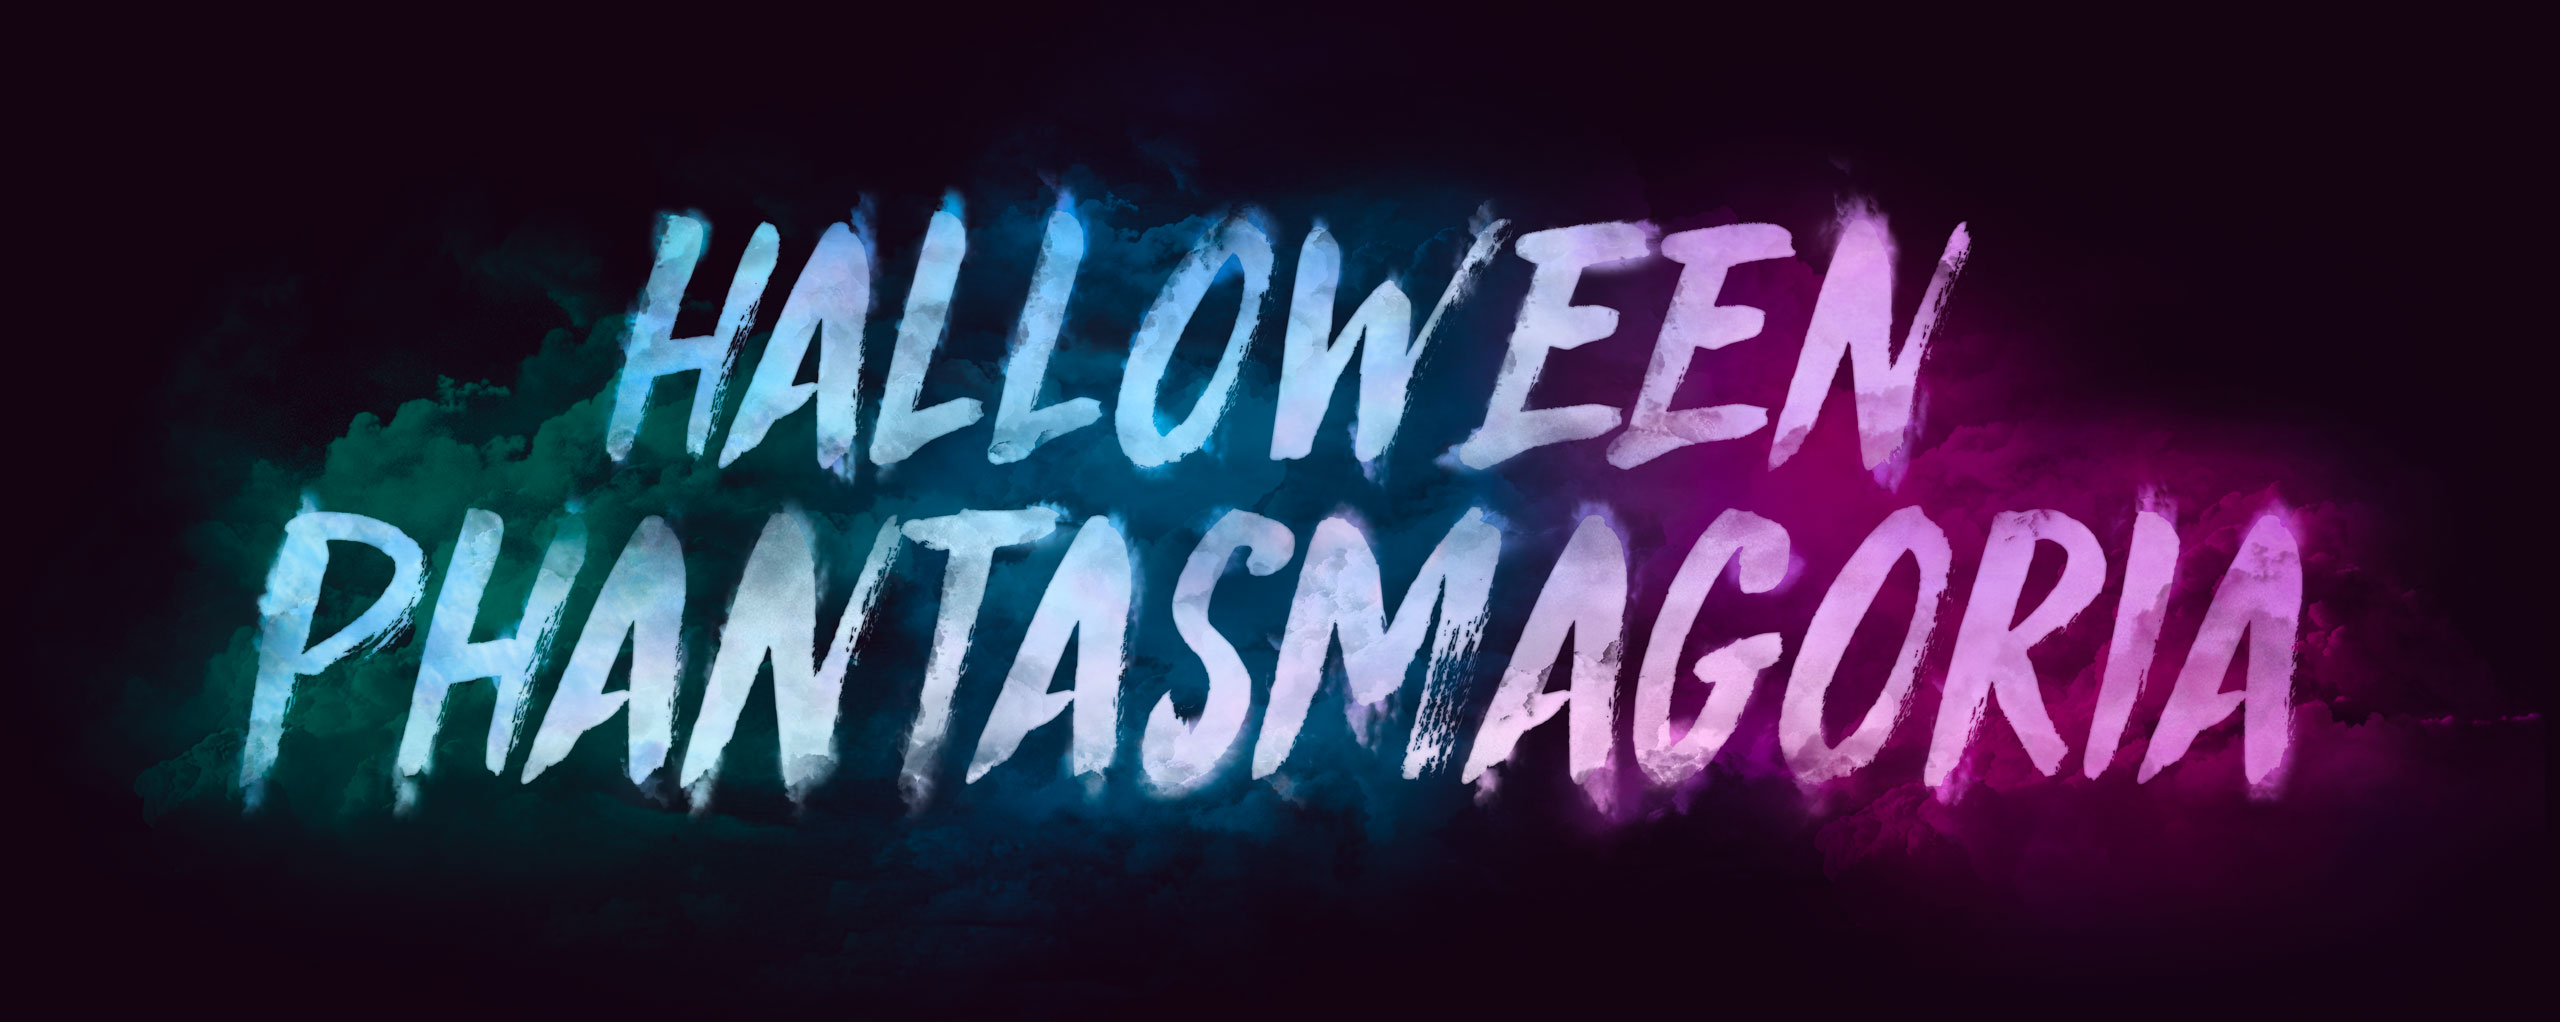 Halloween Phantasmagoria